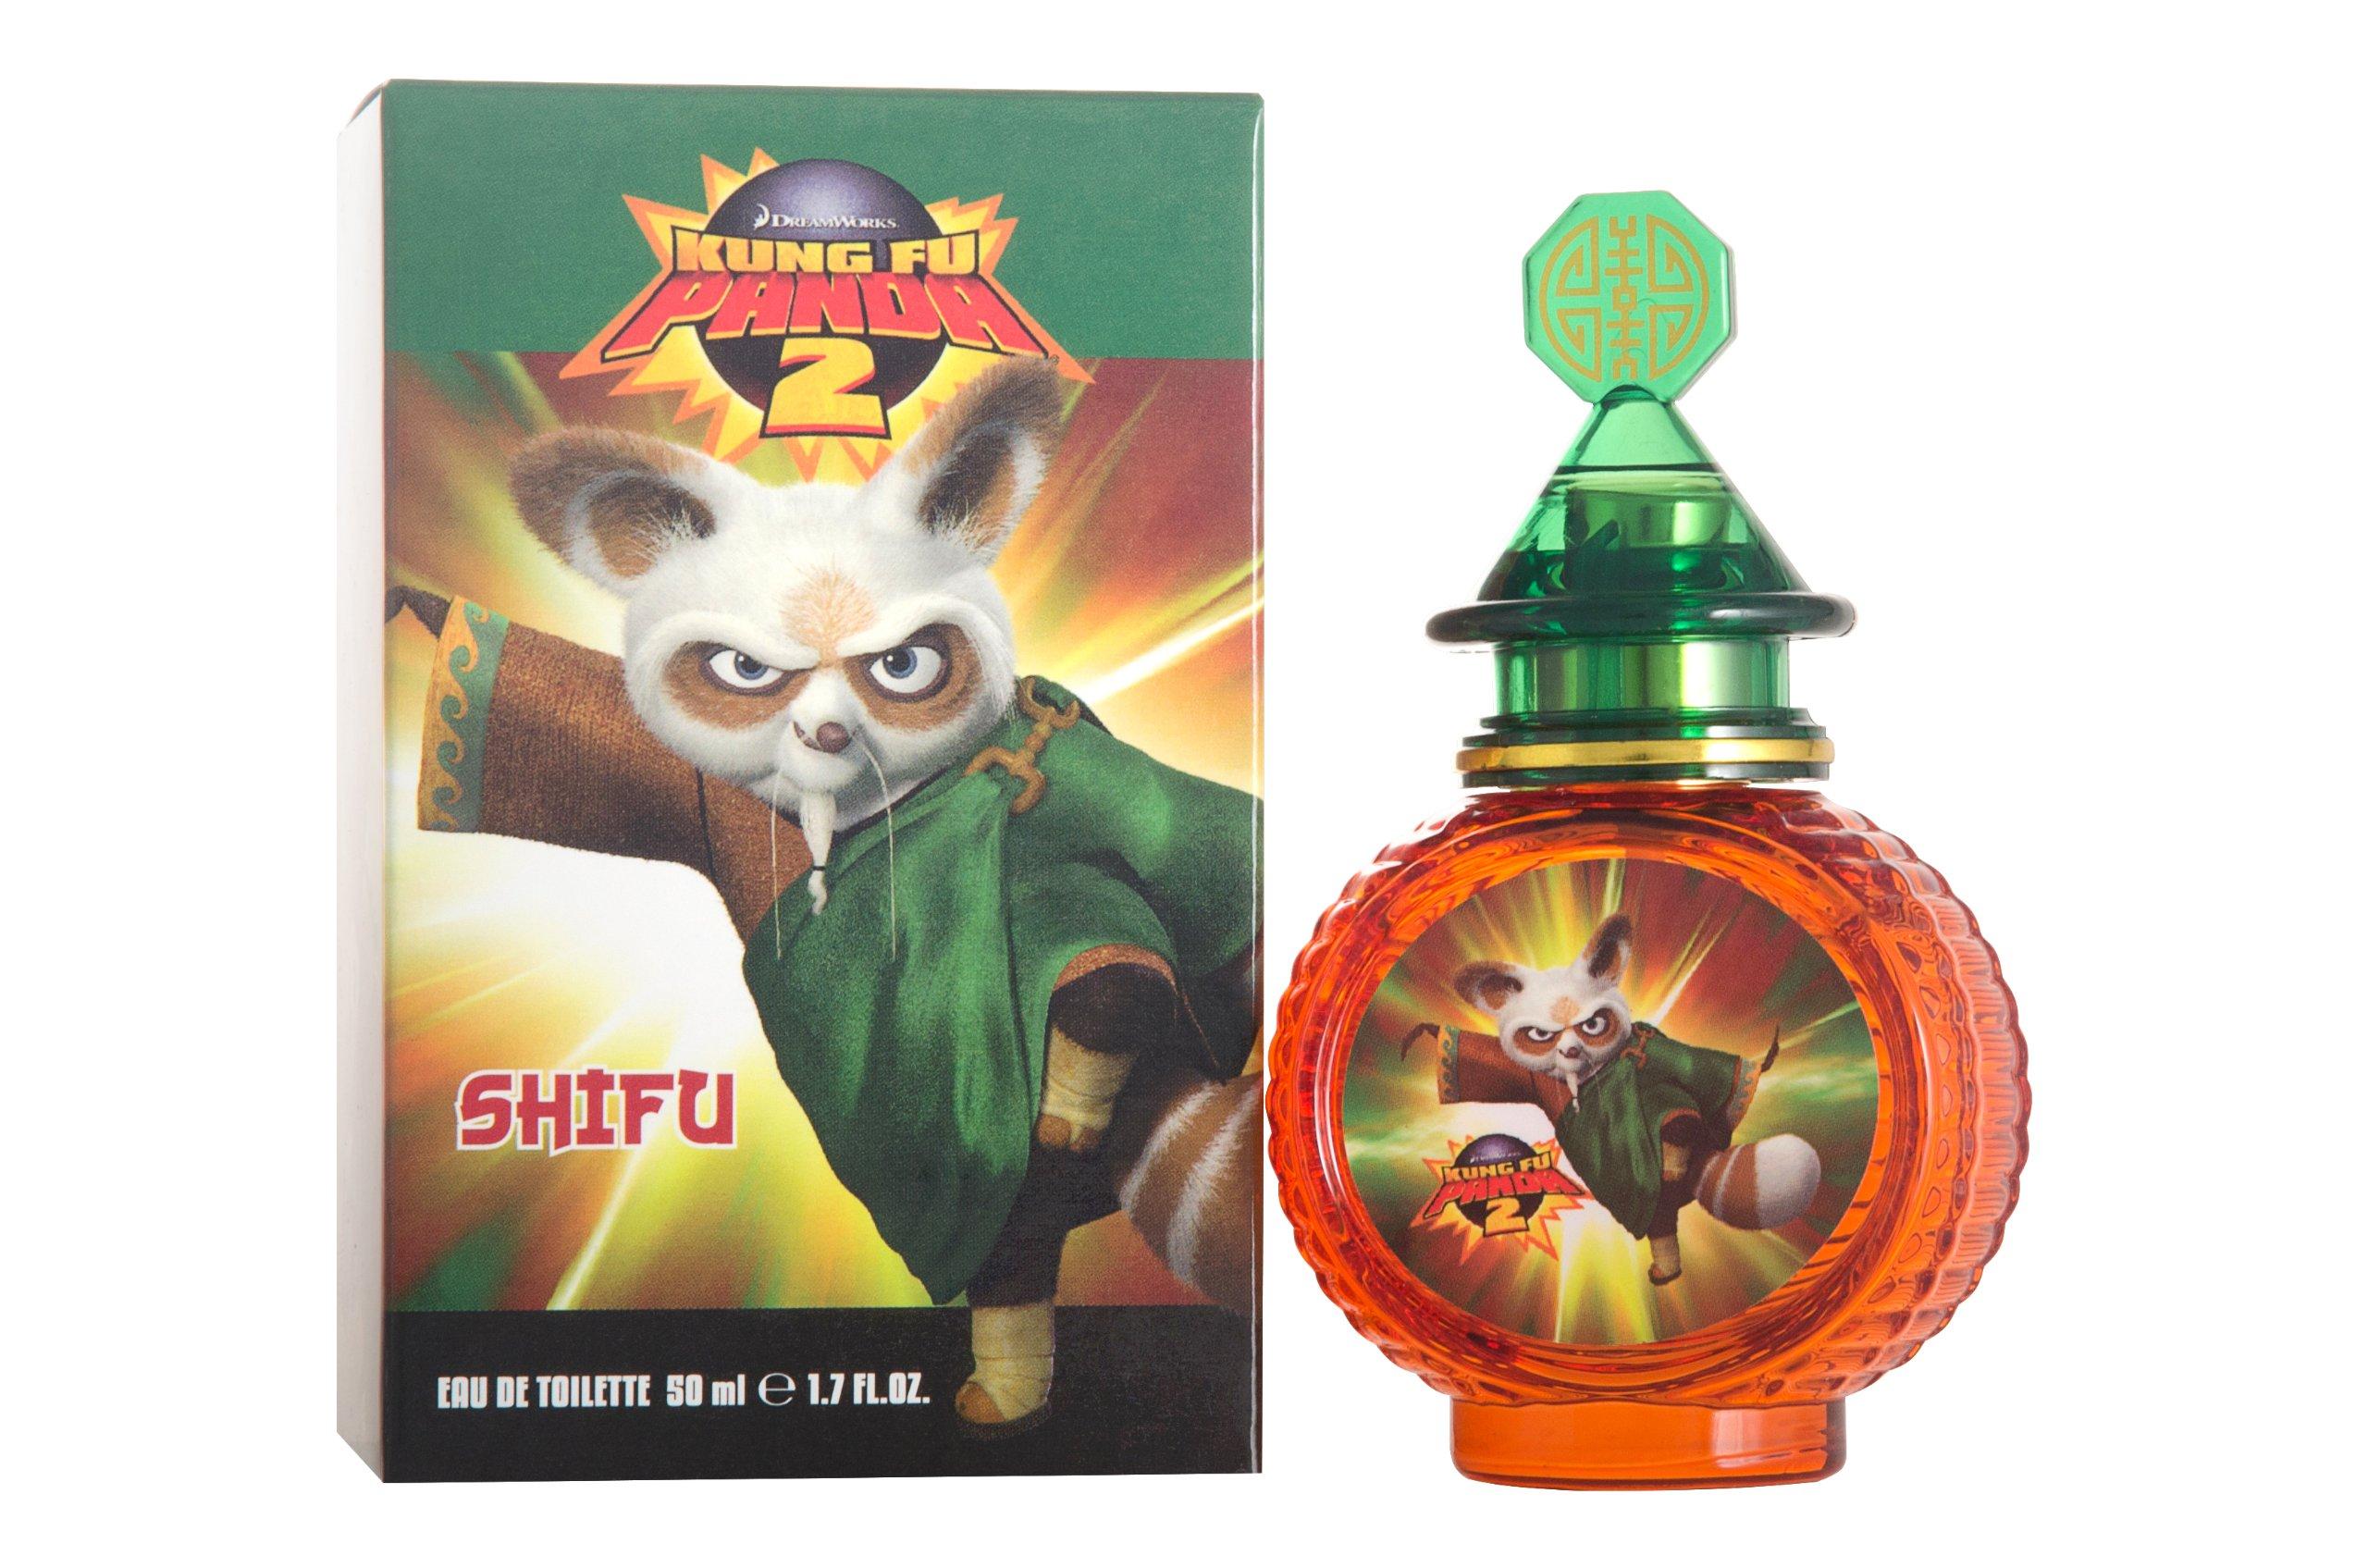 Dreamworks Kung Fu Panda 2 Eau de Toilette Spray for Kids, Shifu, 1.7 Ounce